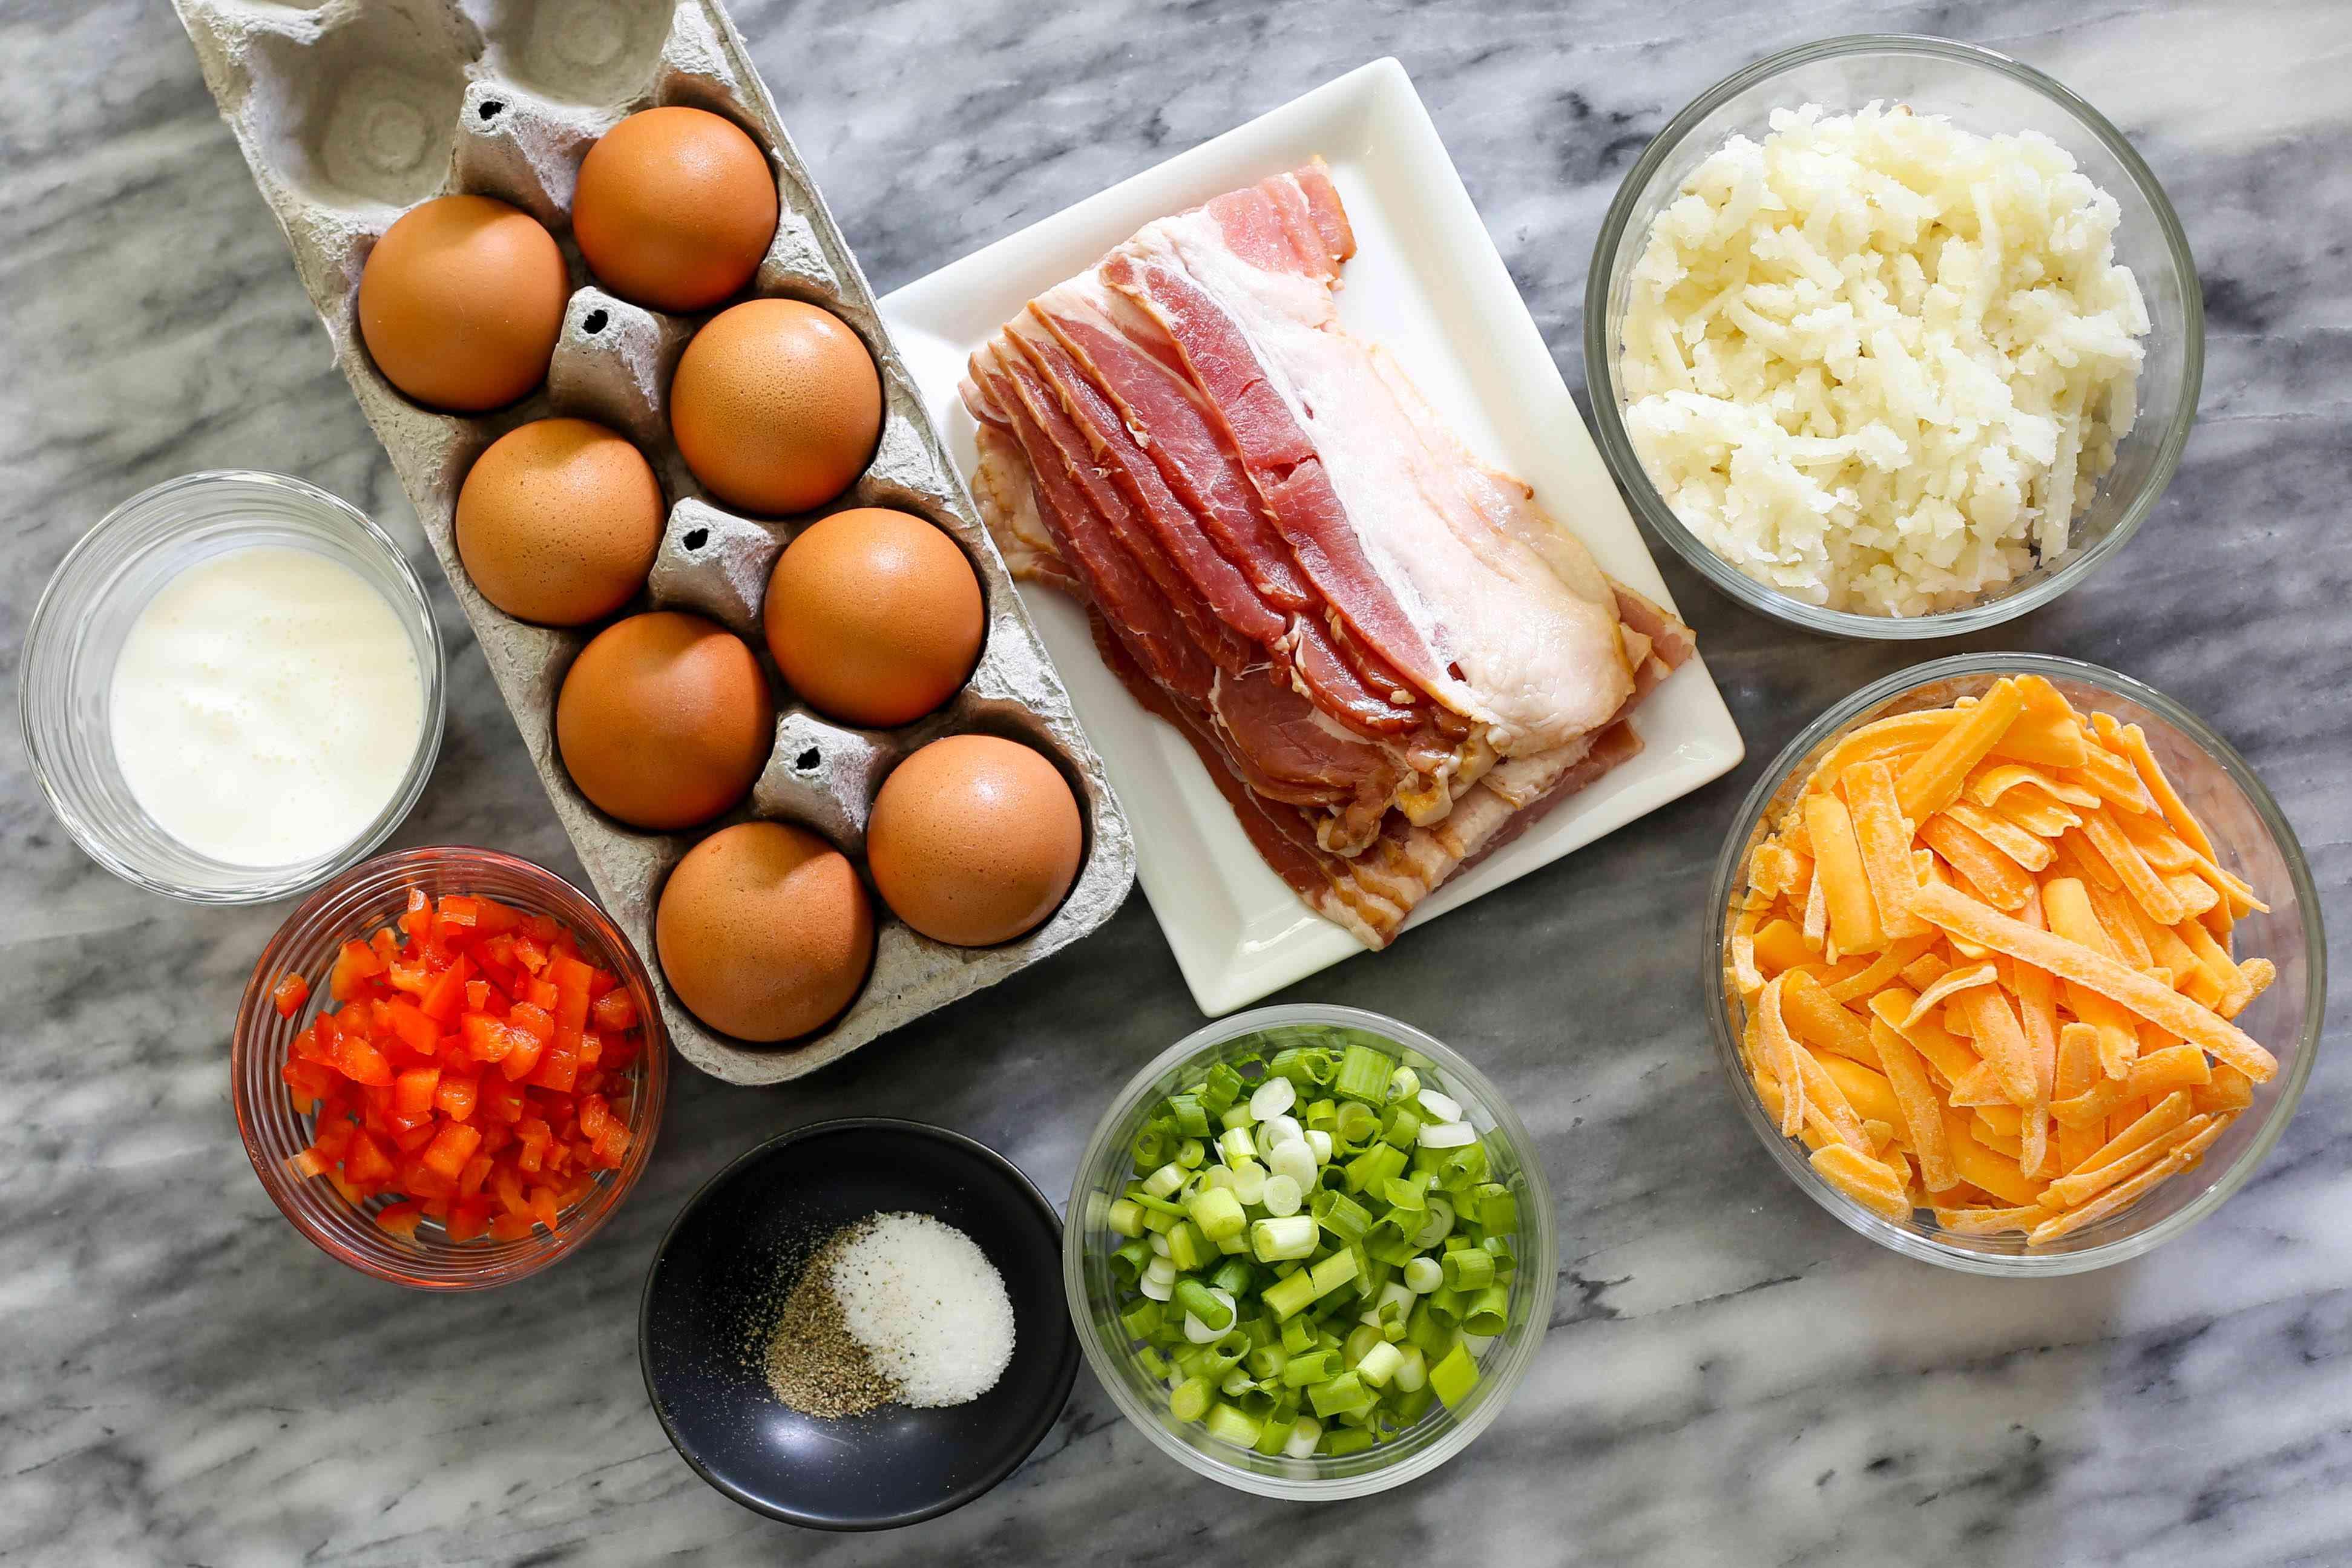 ingredients for instant pot breakfast casserole